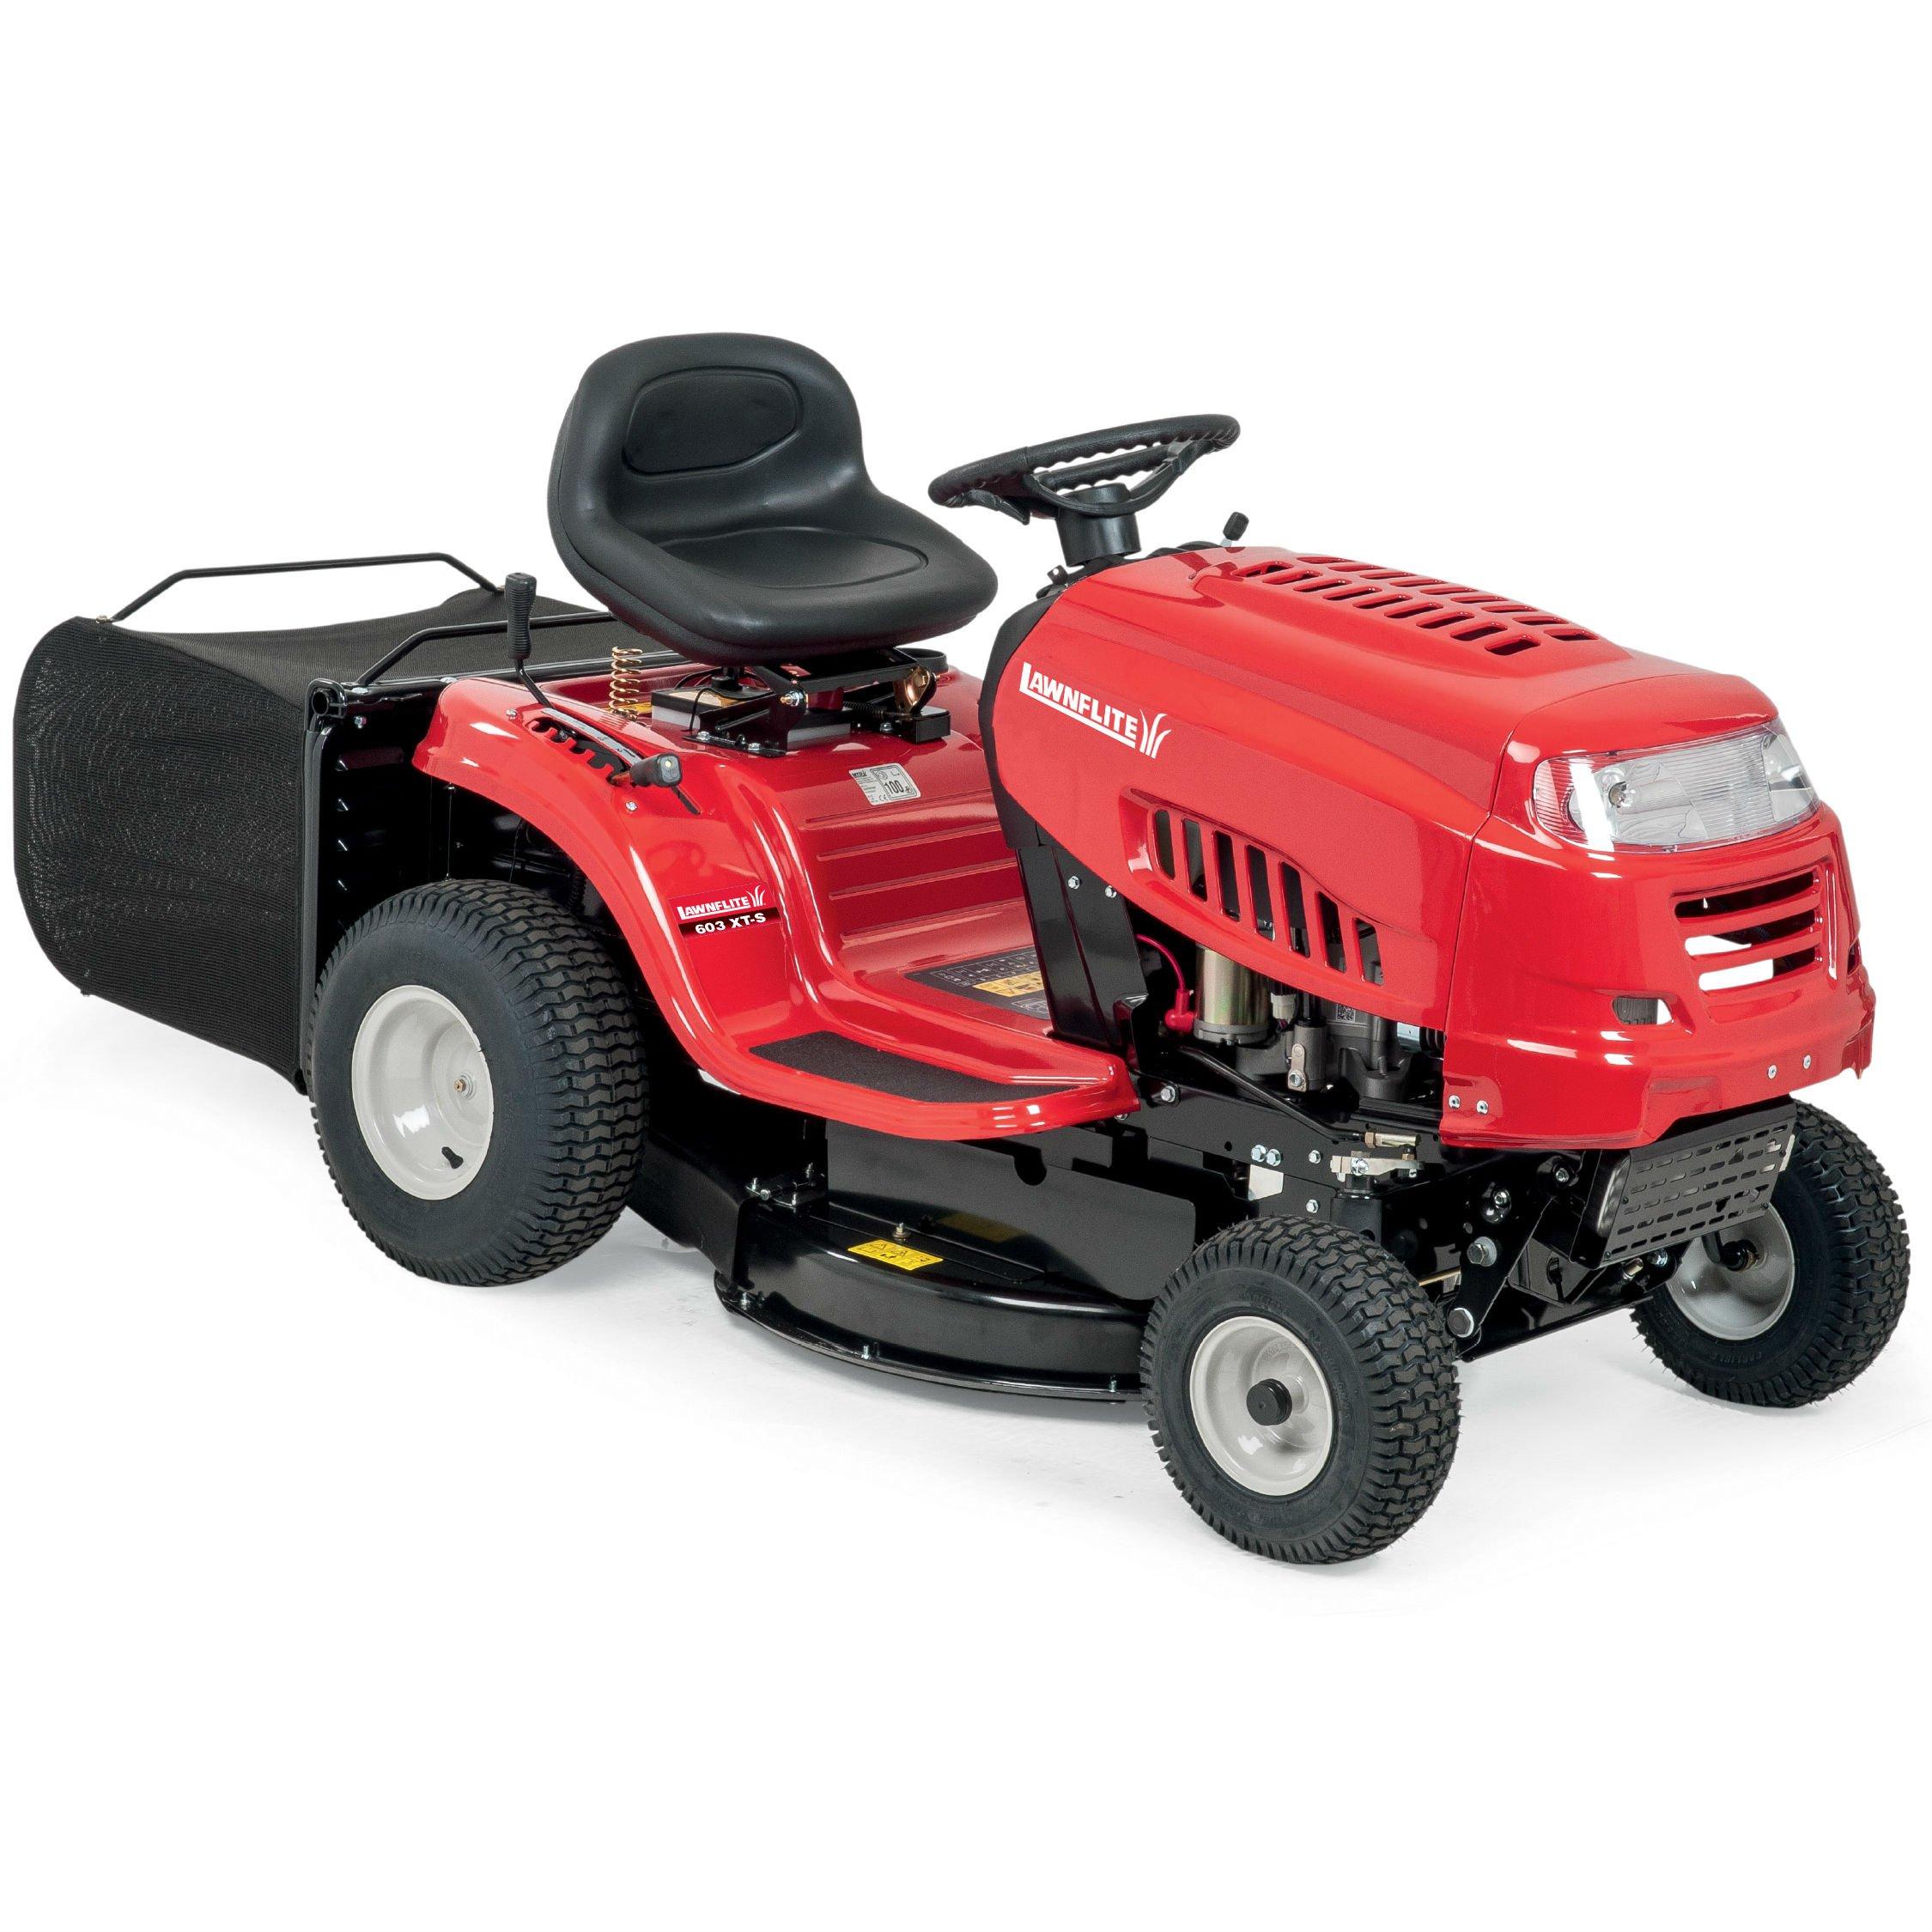 Mtd Lawn Tractor : Lawnflite xt s lawn tractor